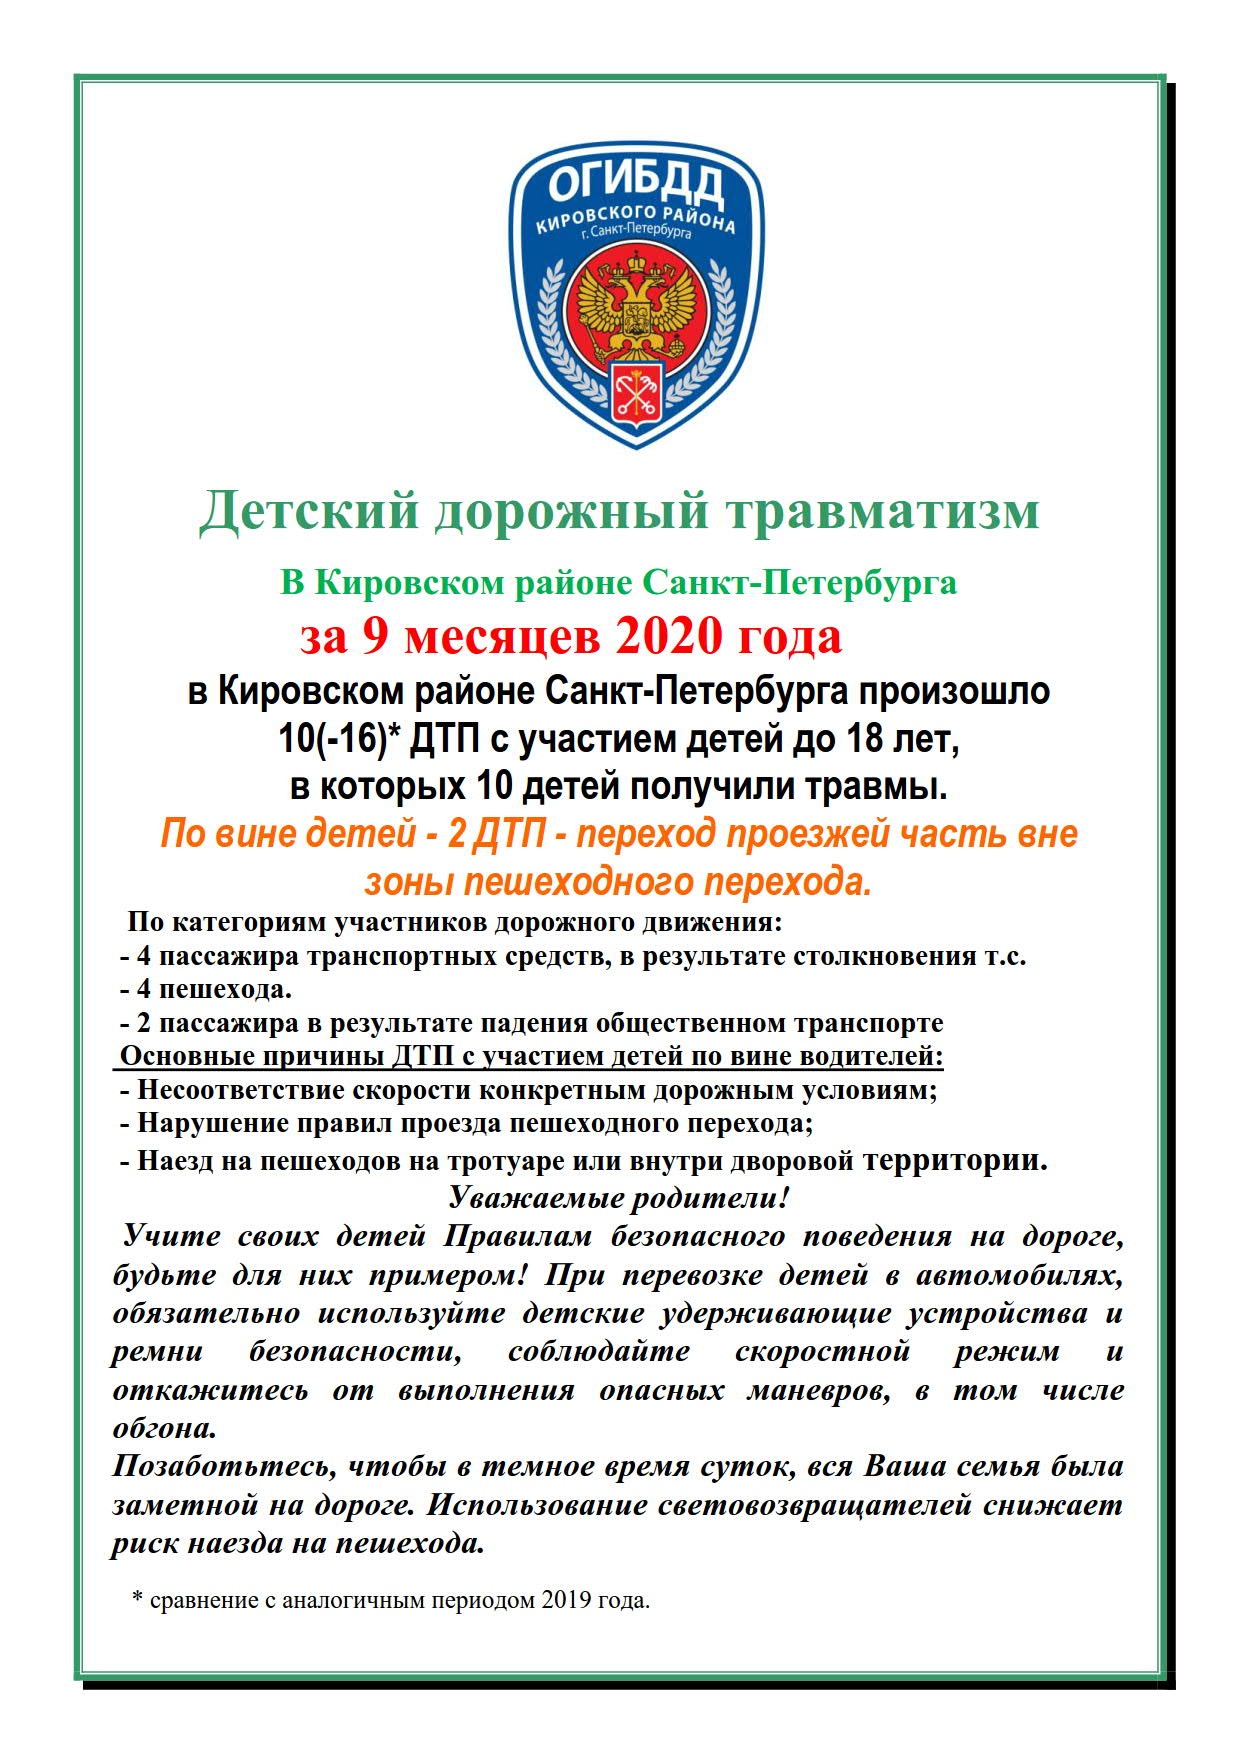 листовка ДДТТ 9 мес 2020_1